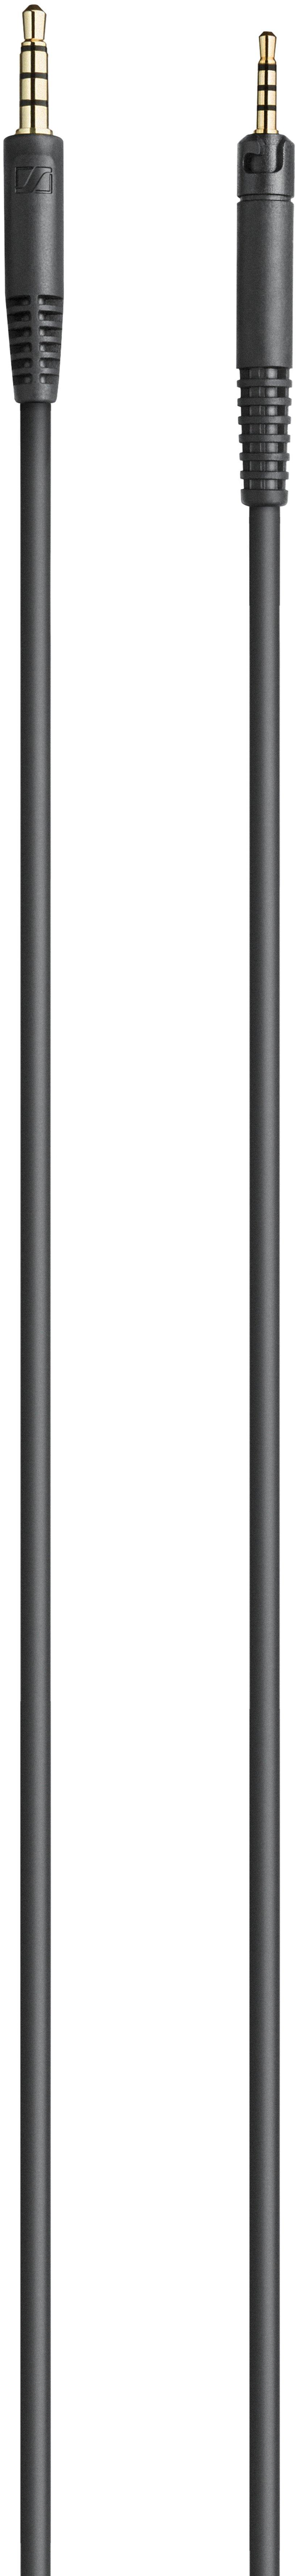 SENNHEISER HD 599 Beige, Brun, Silver